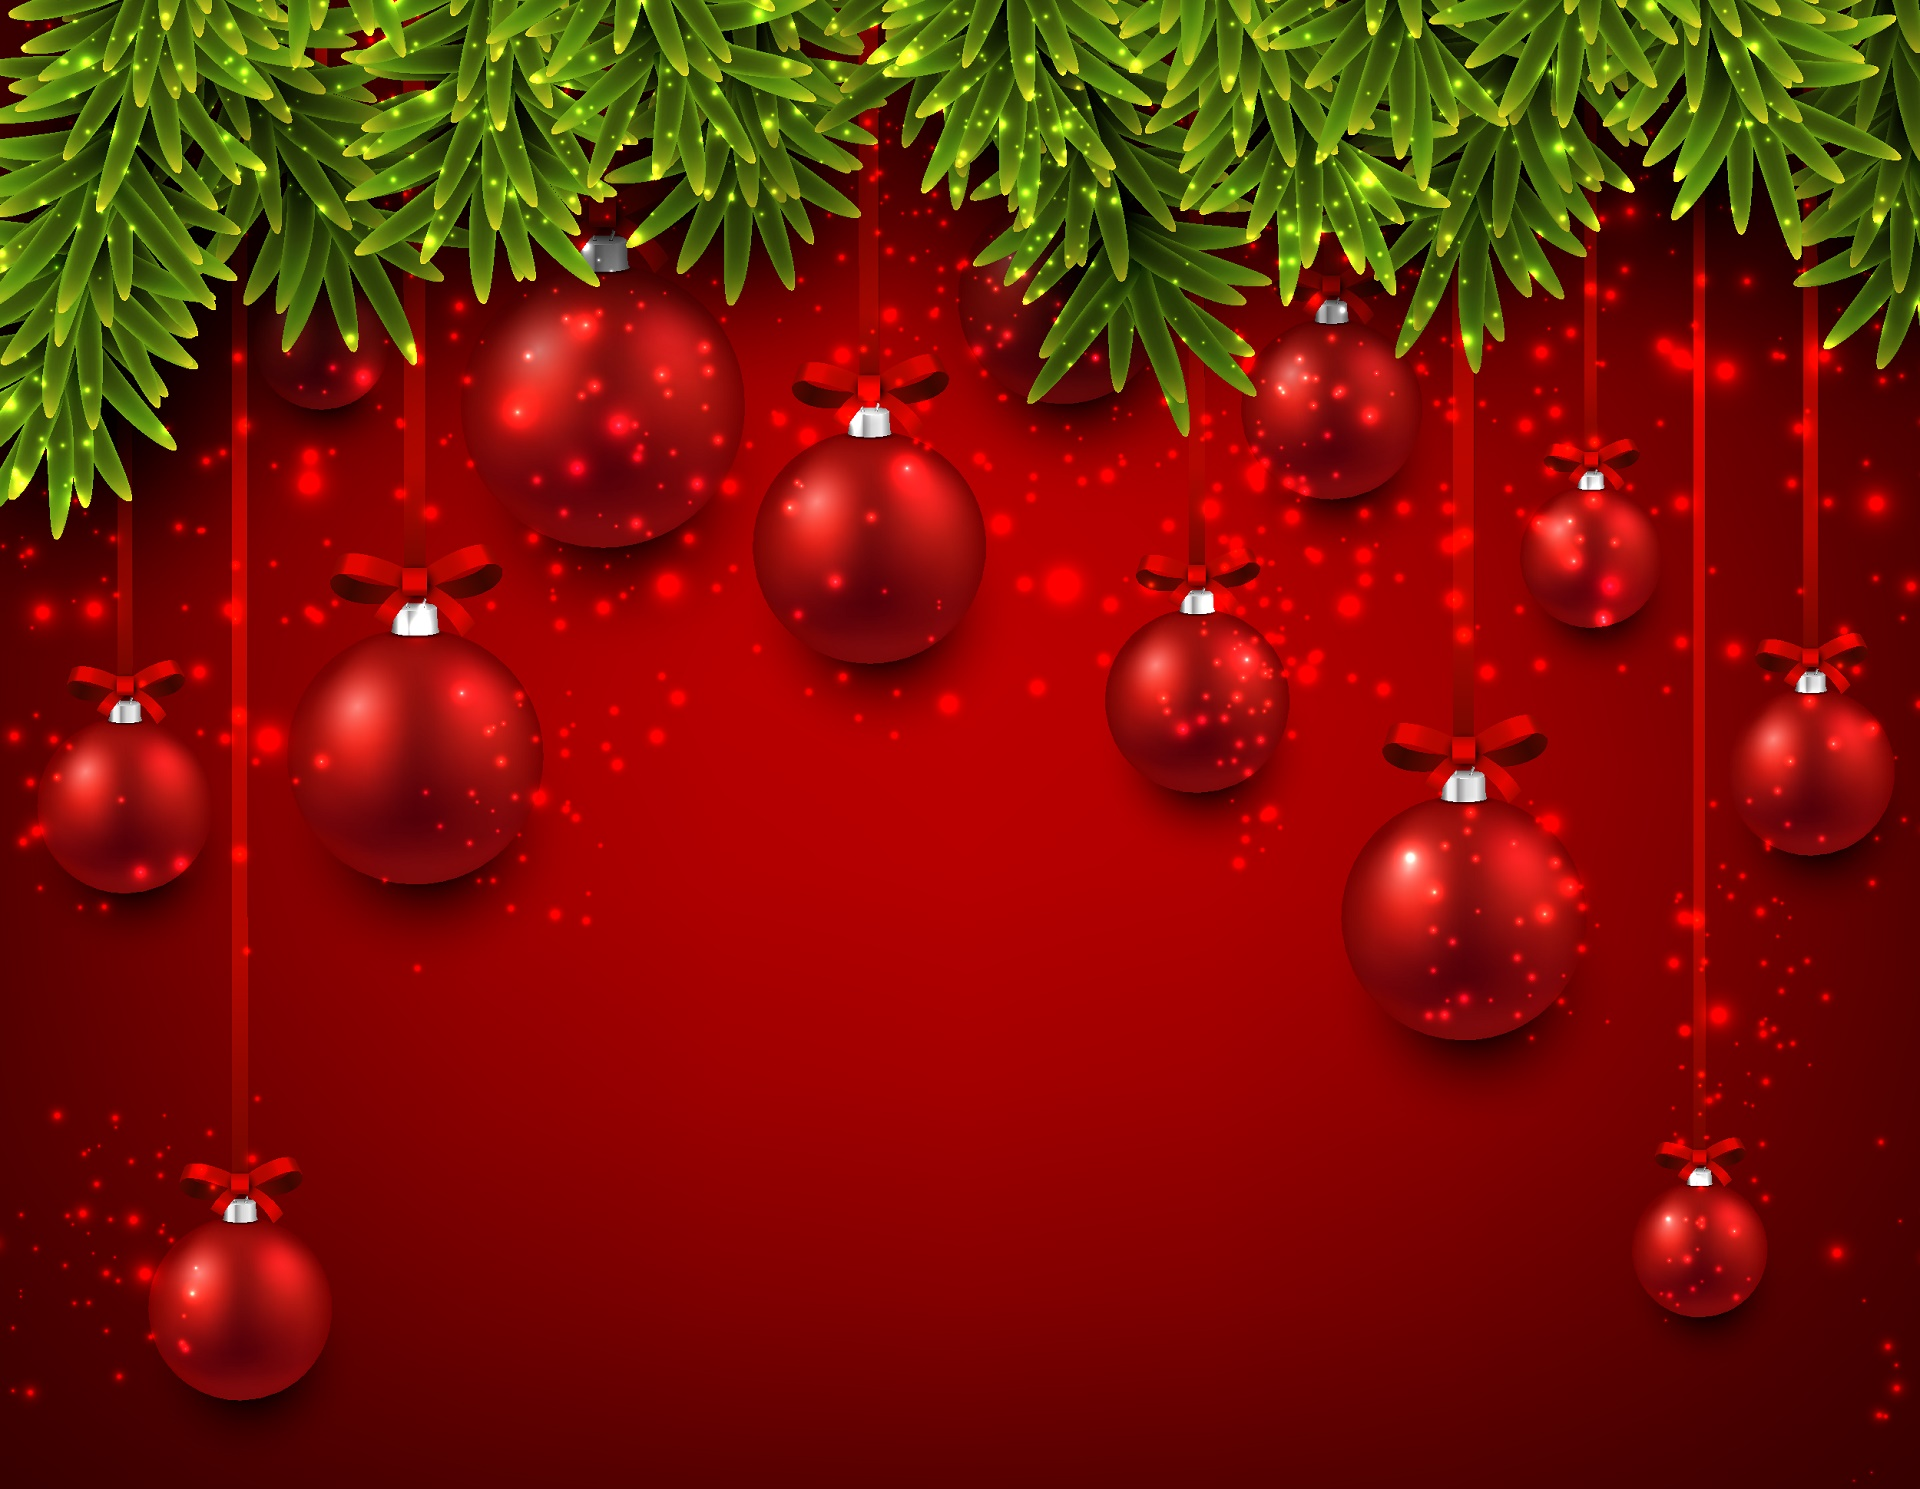 Christmas hd wallpaper background image 1920x1489 id for Natale immagini per desktop